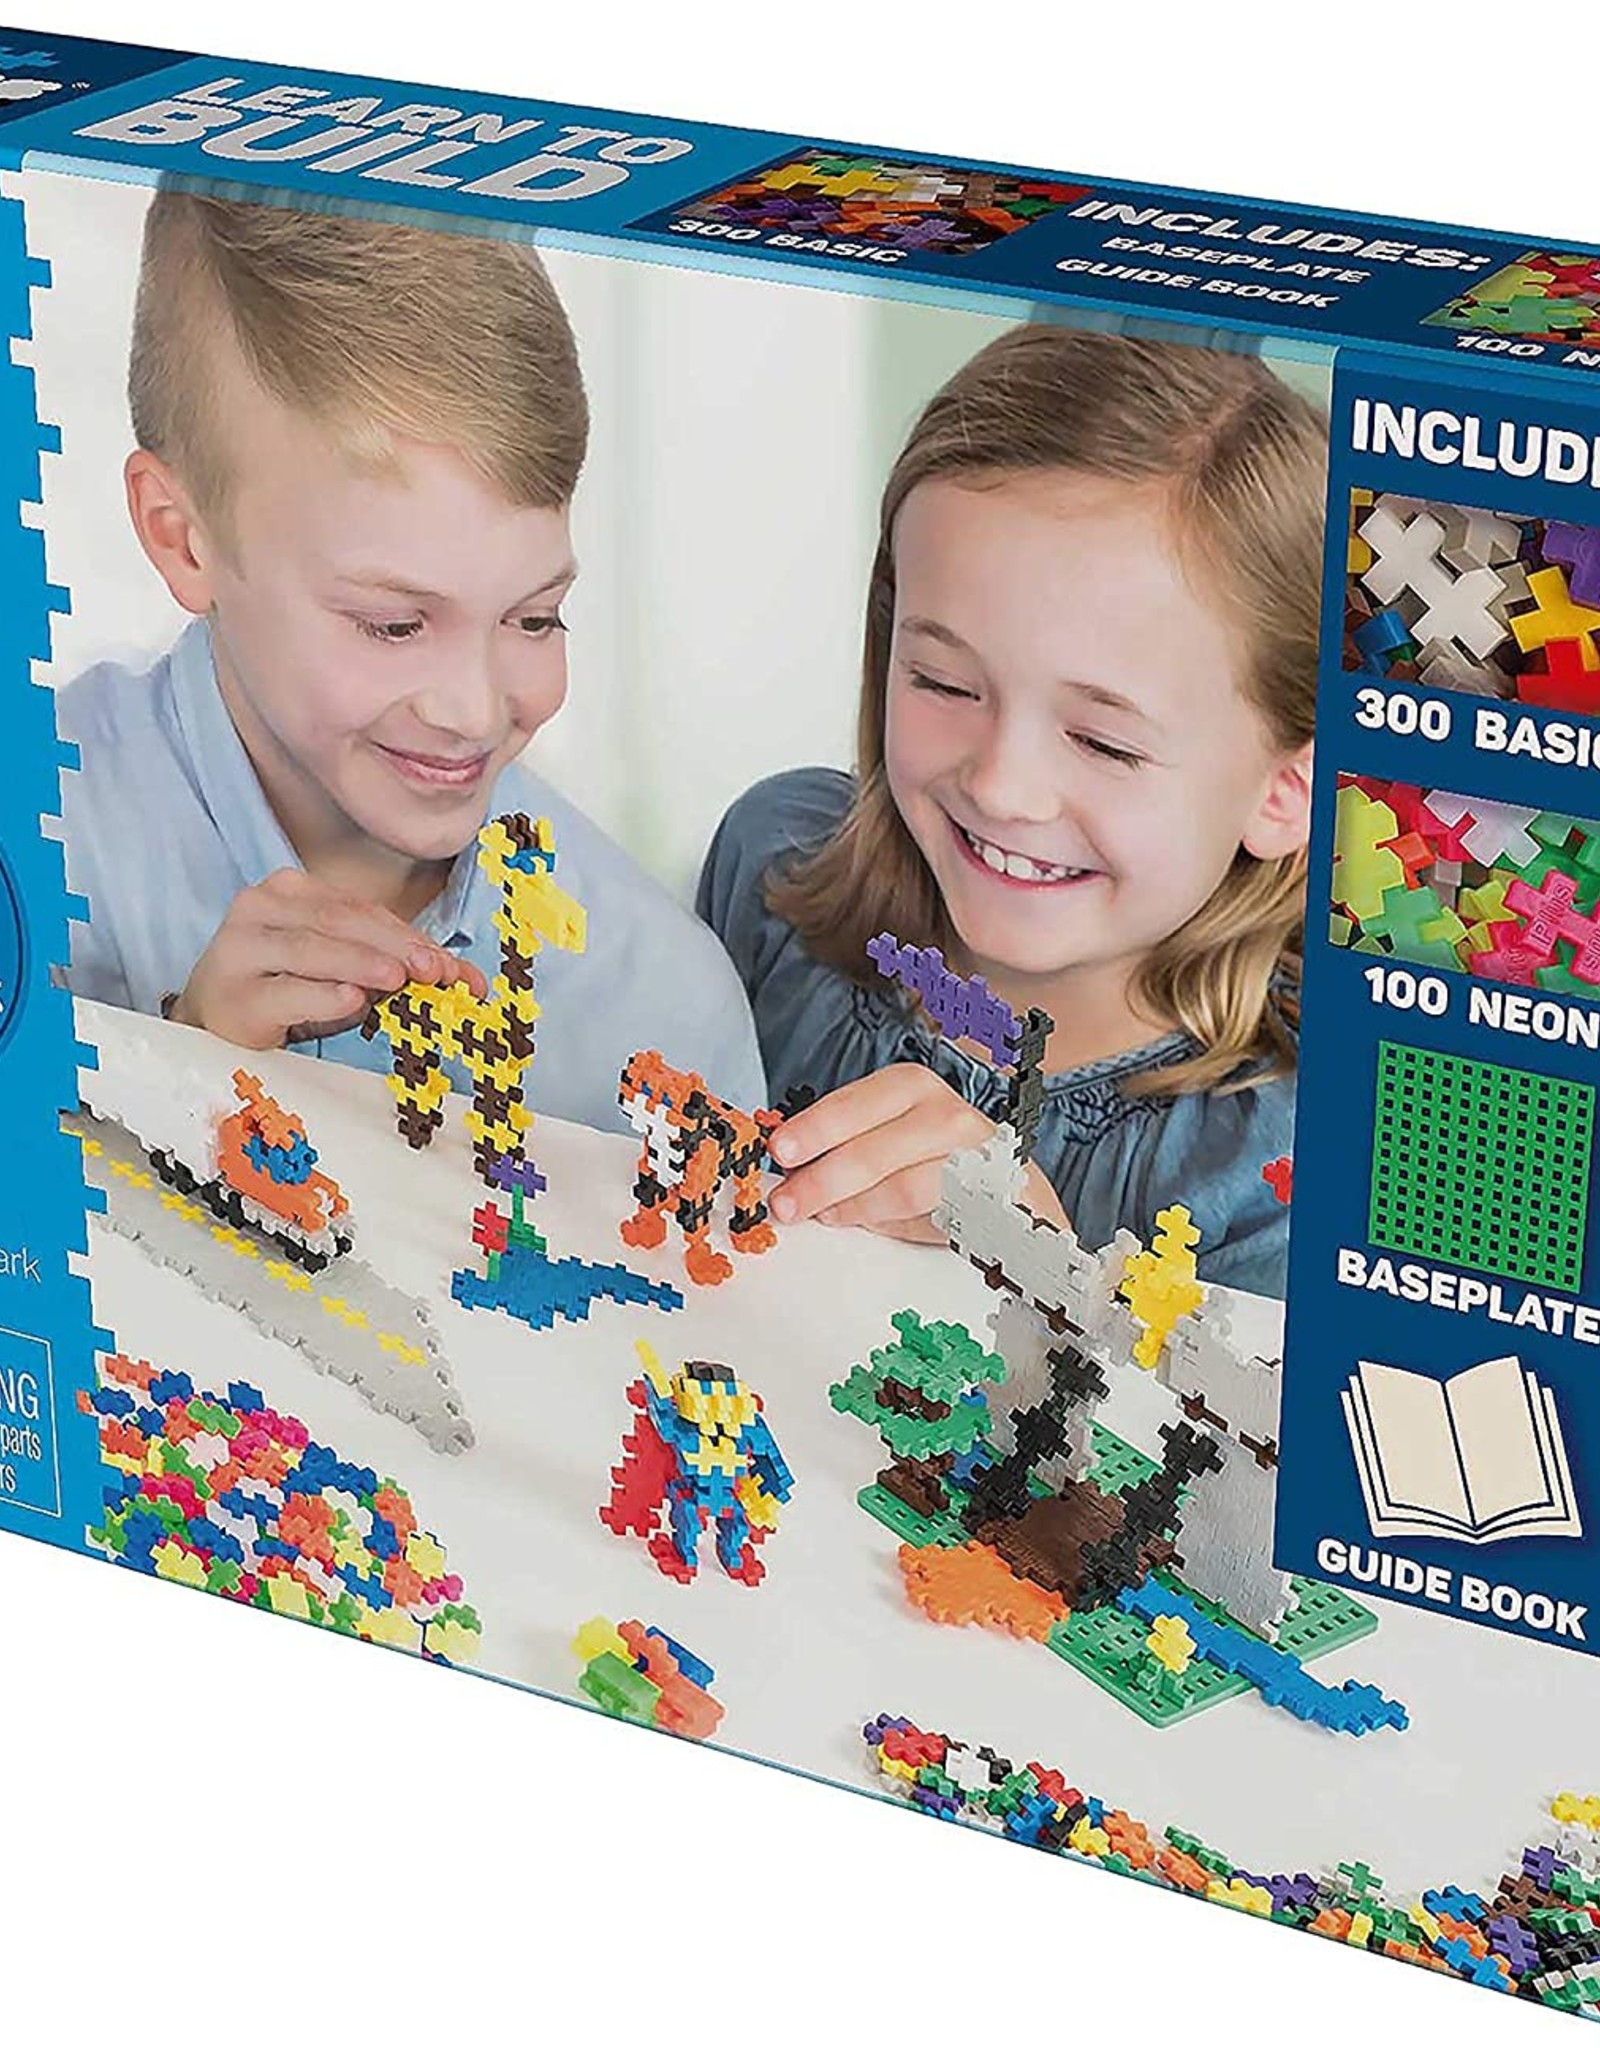 Learn to Build - Basic 400 Pc. Plus-Plus